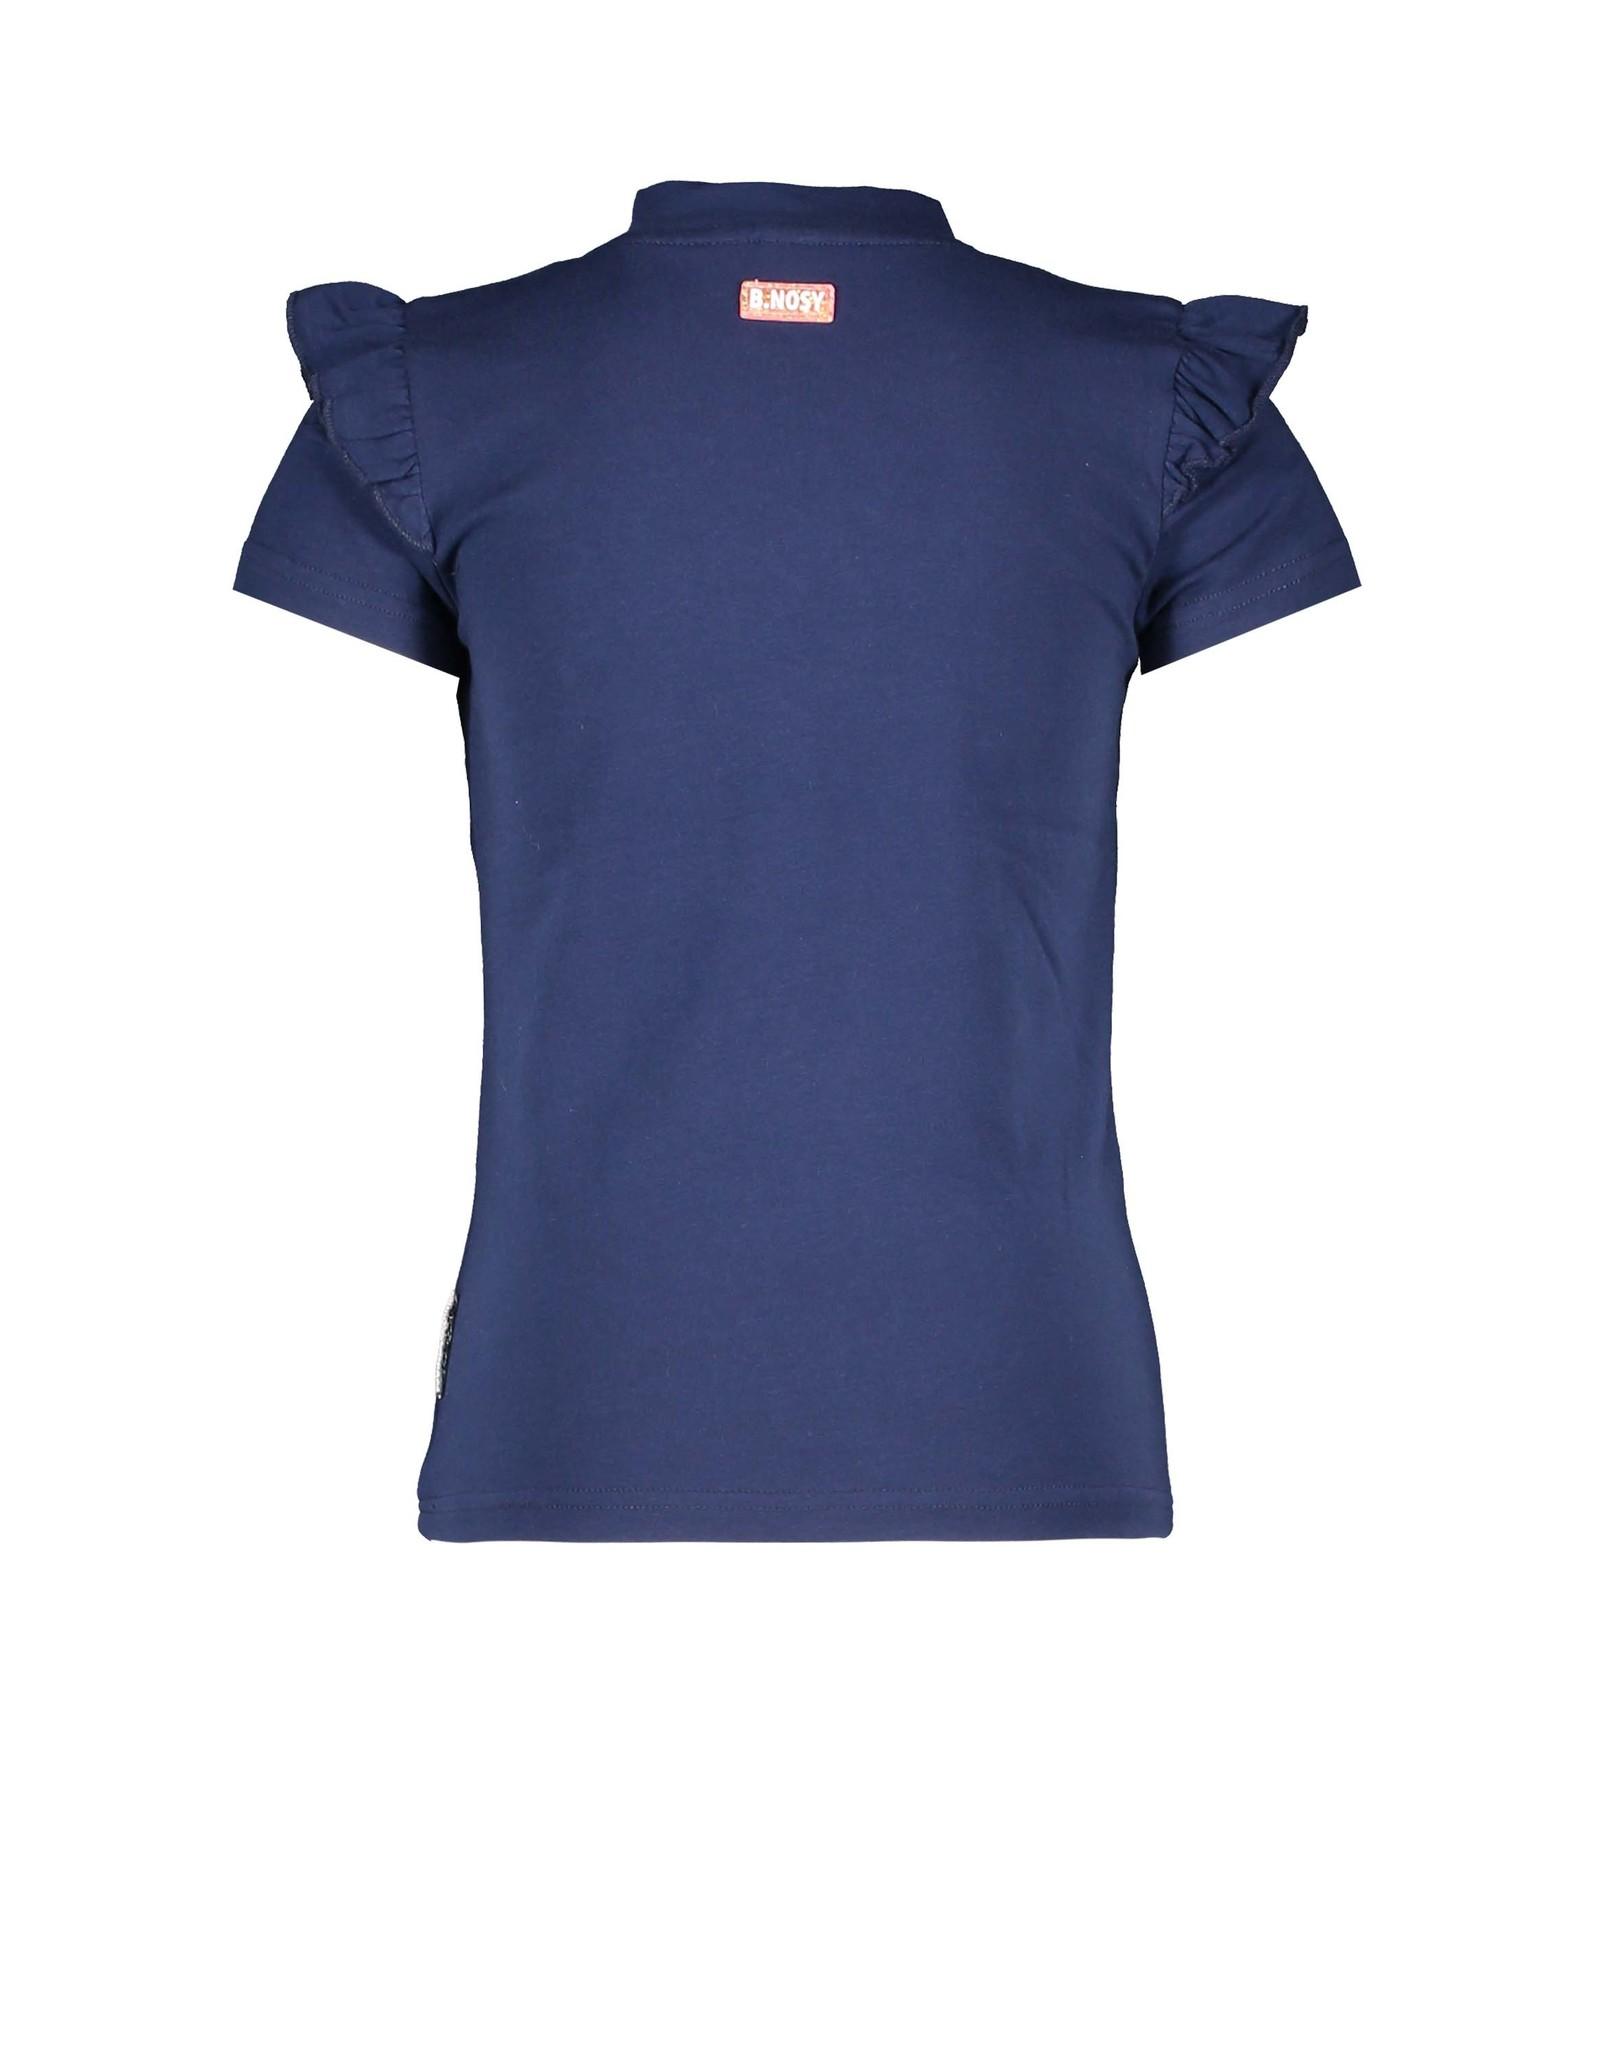 B.Nosy Girls t-shirt with tassel artwork